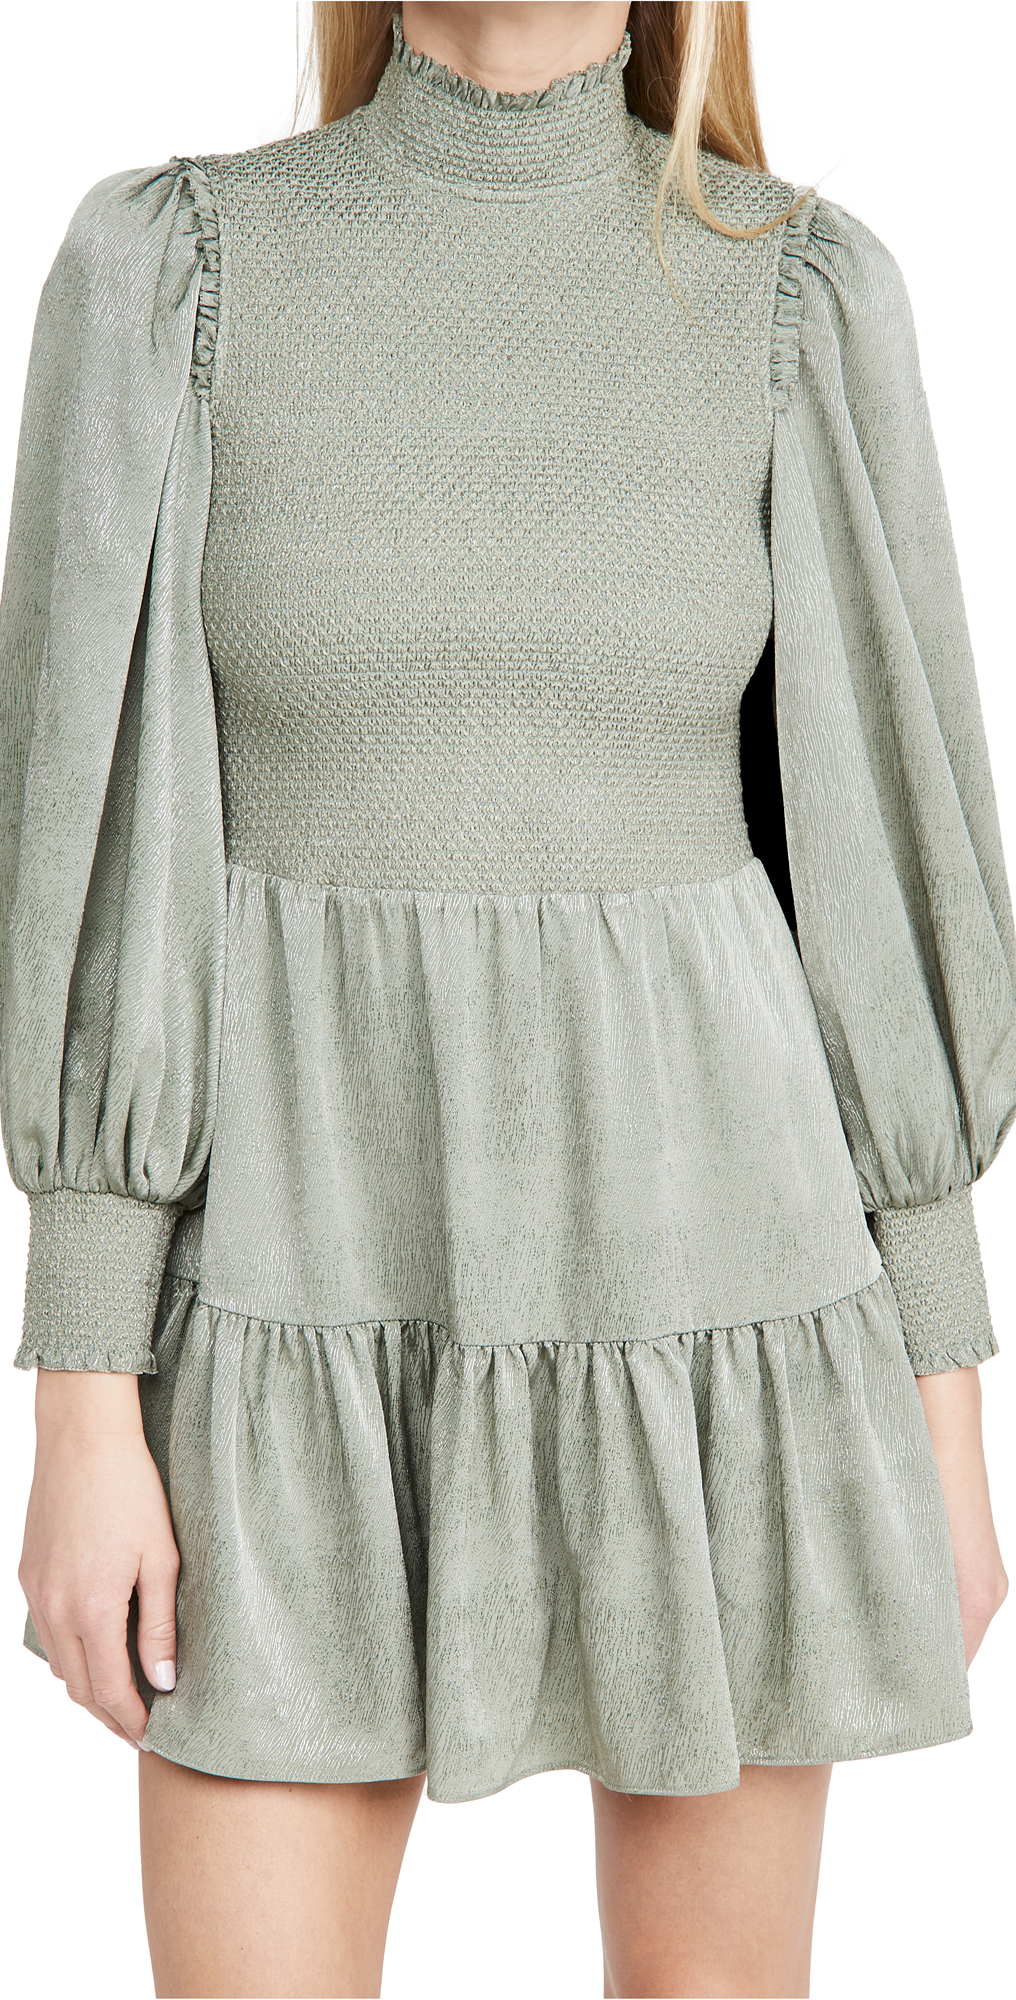 alice + olivia Elvira Smocked Bodice Tiered Dress